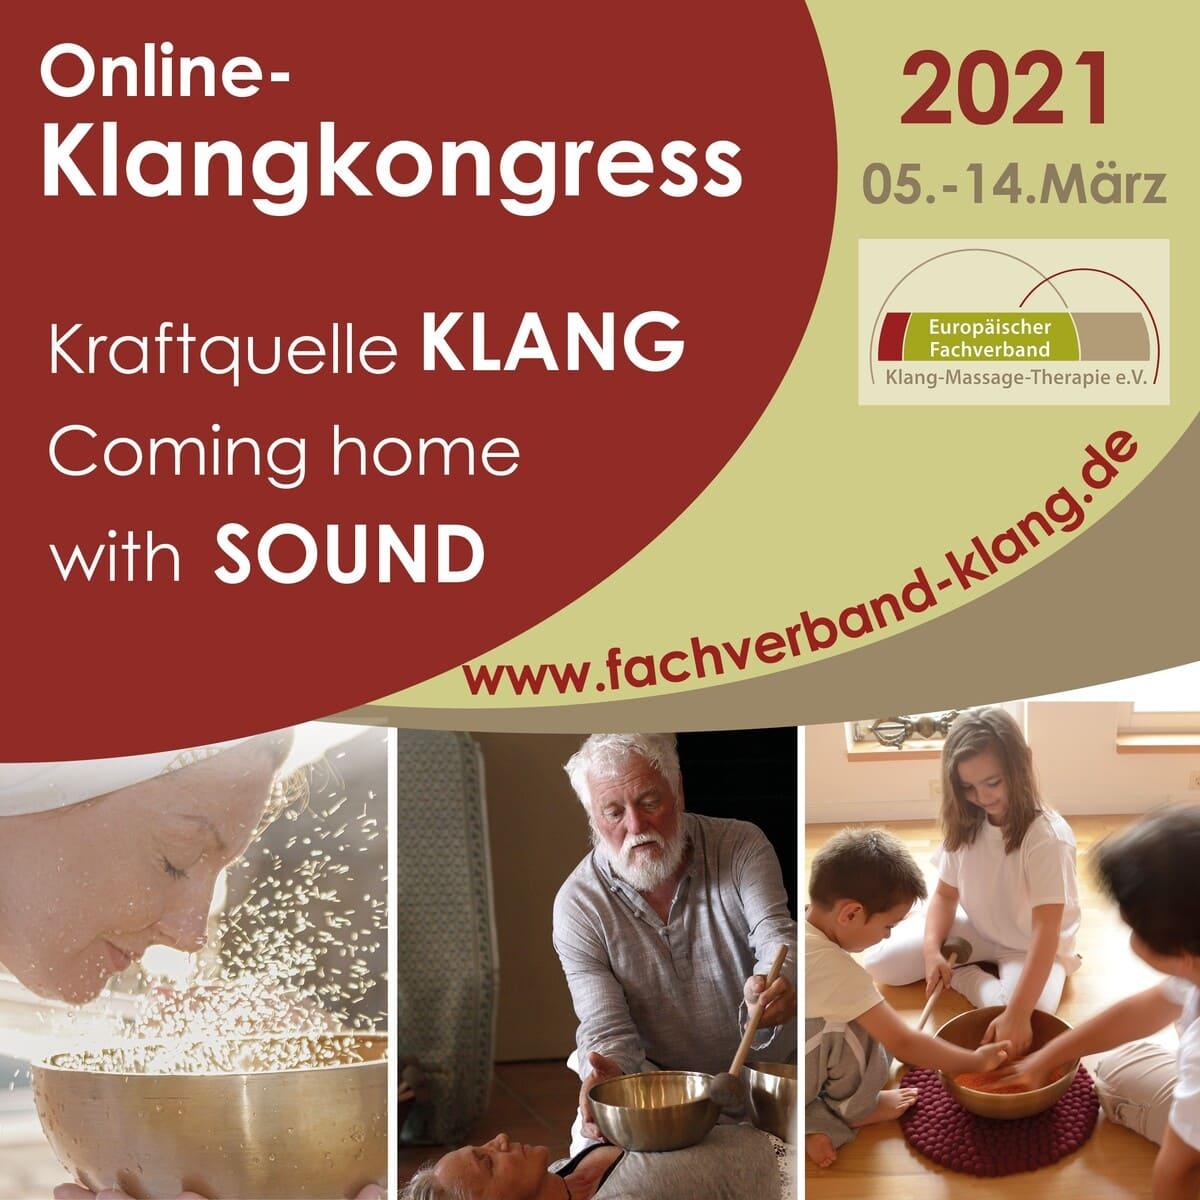 Klangkongress Kraftquelle Klang 2021